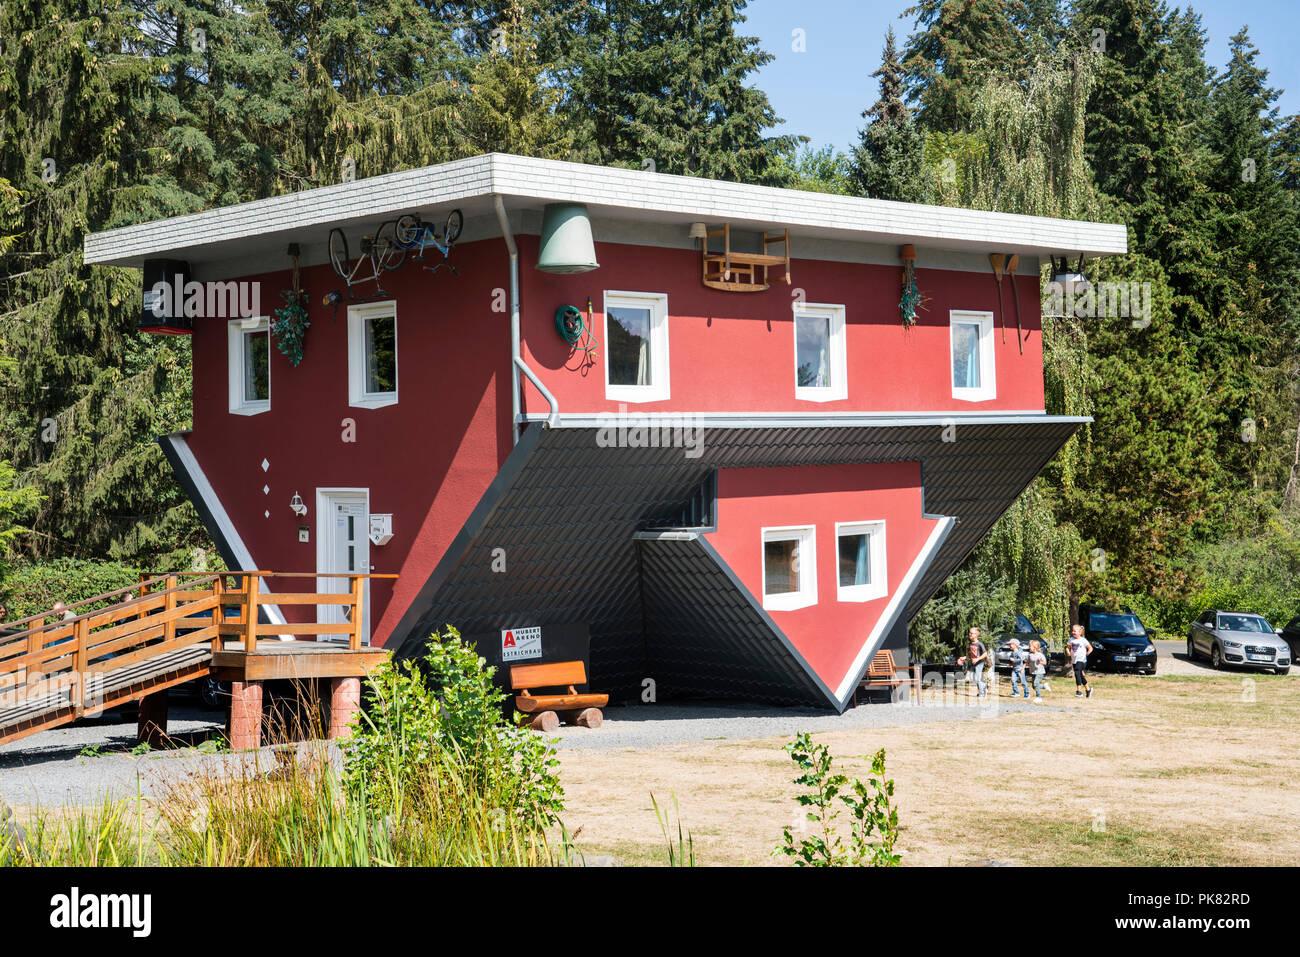 House upside down, Das Tolle Haus, Affoldern, Edersee, Hesse, Europe - Stock Image